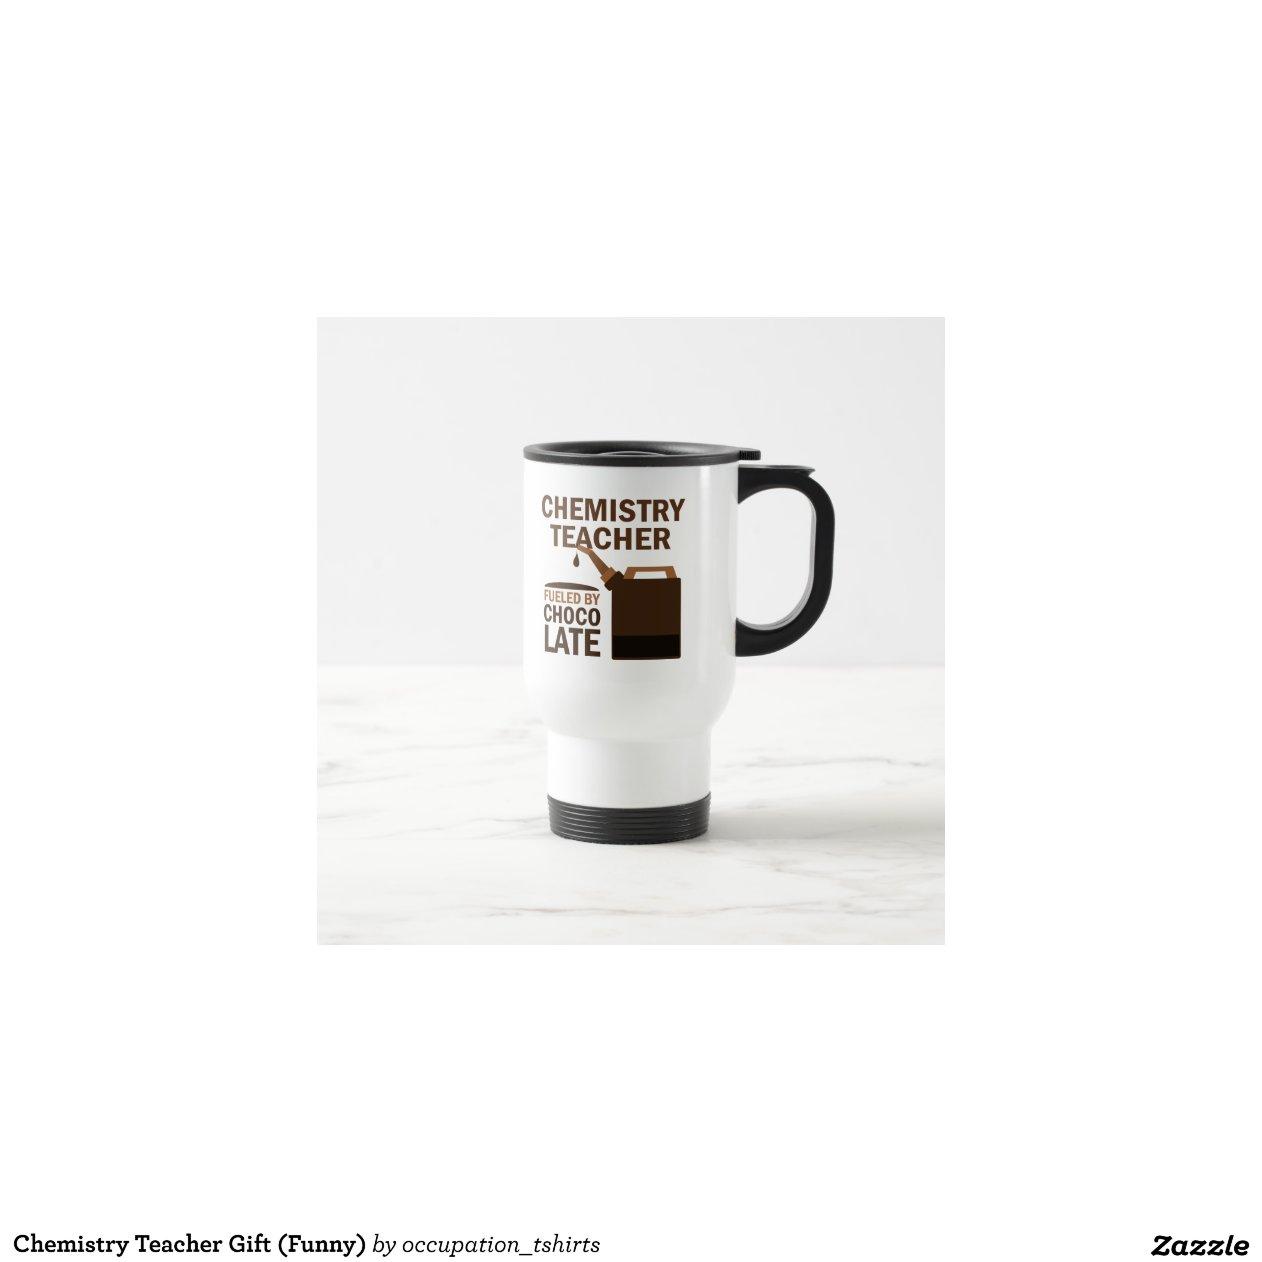 chemie lehrer geschenk lustig kaffeetasse zazzle. Black Bedroom Furniture Sets. Home Design Ideas